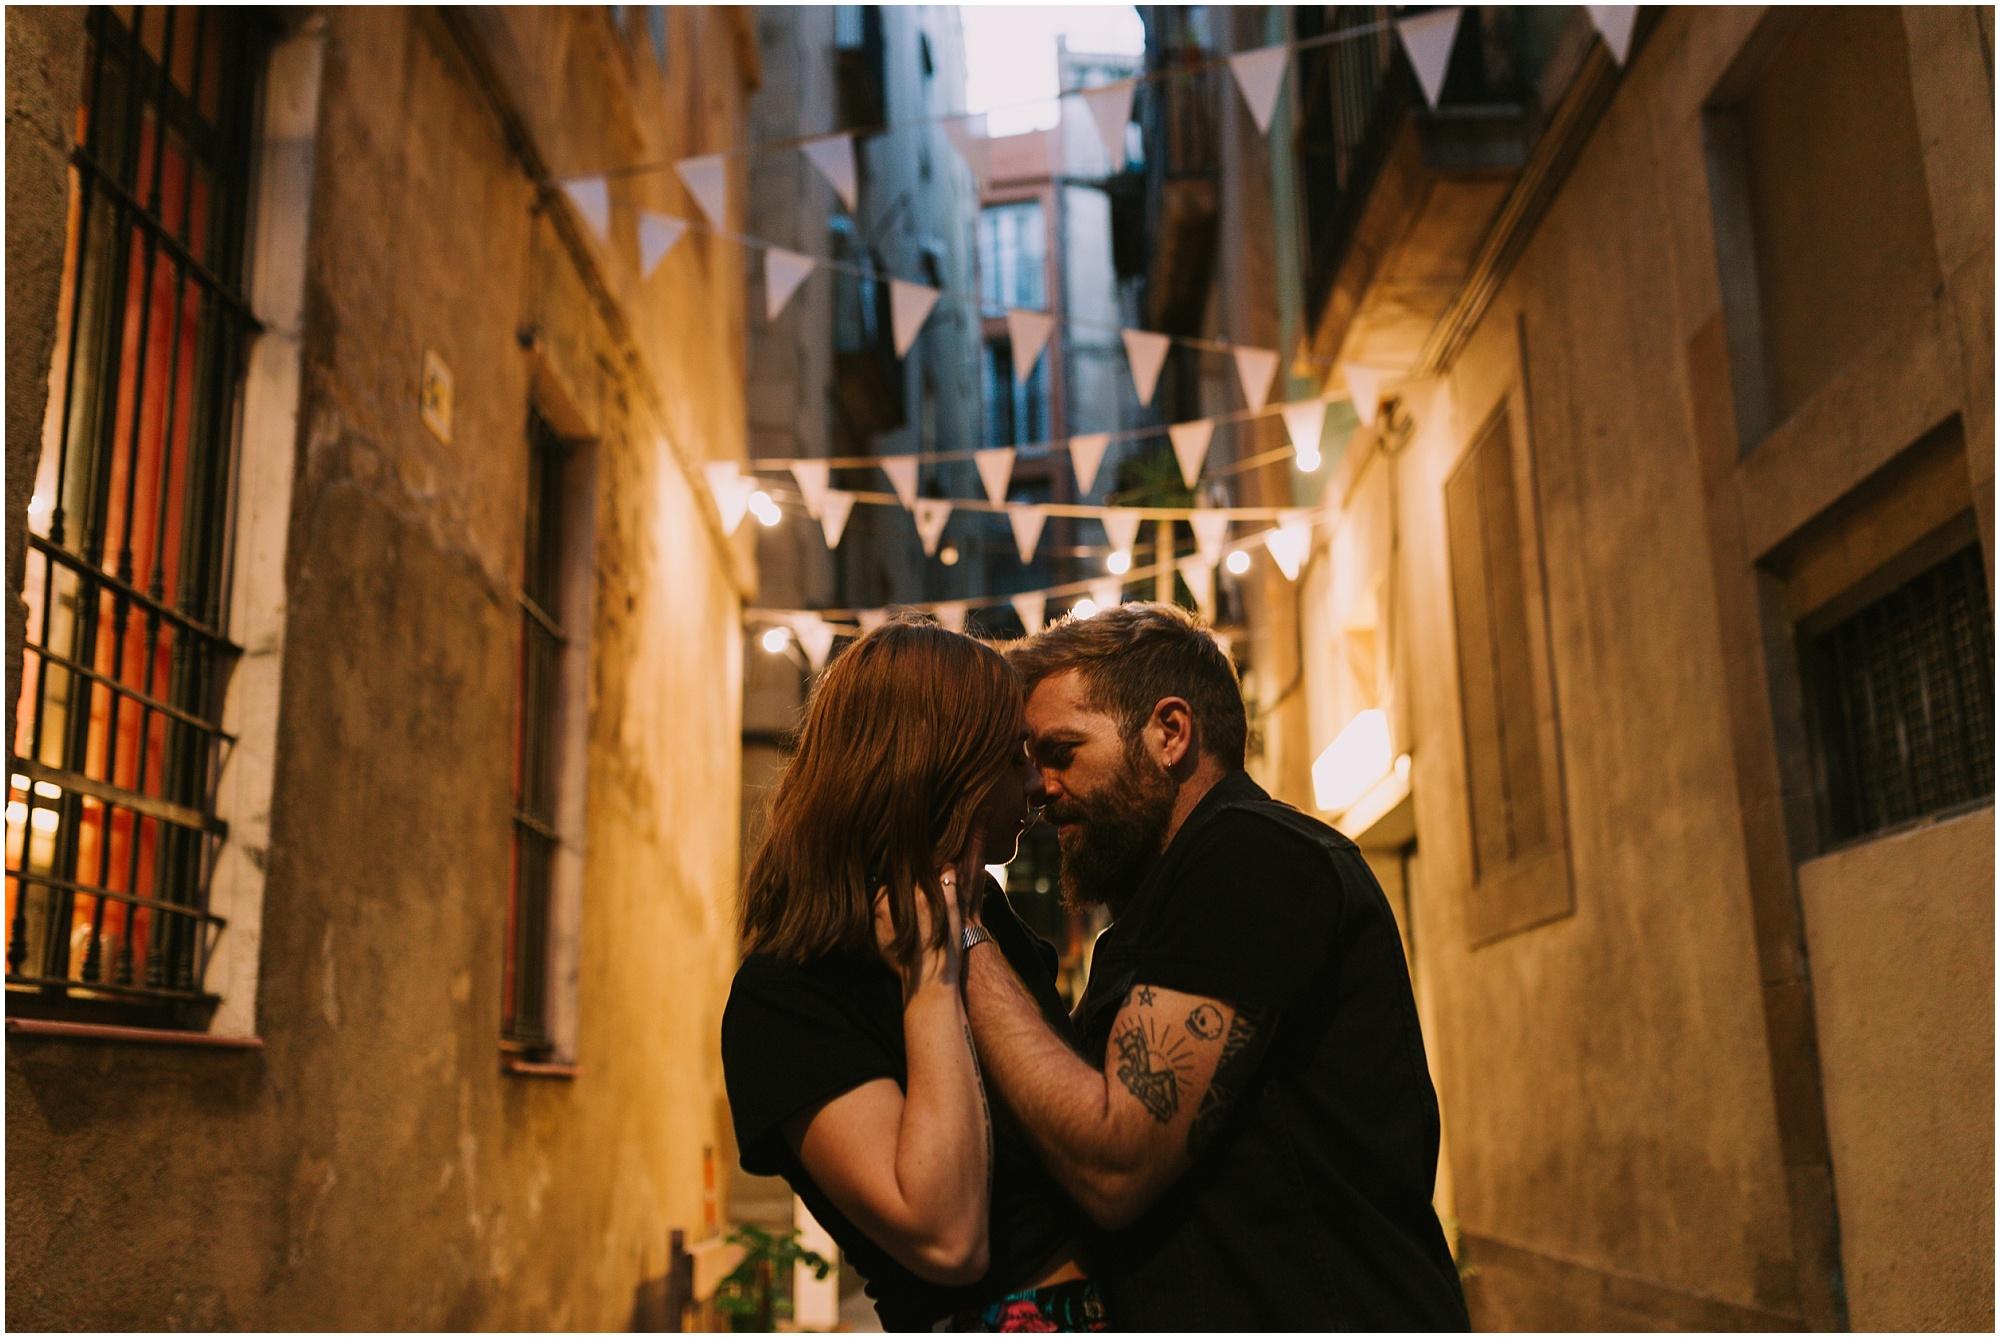 Kateryna-photos-photographer-mariage-boda-love-story-engagement-barcelona_0020.jpg